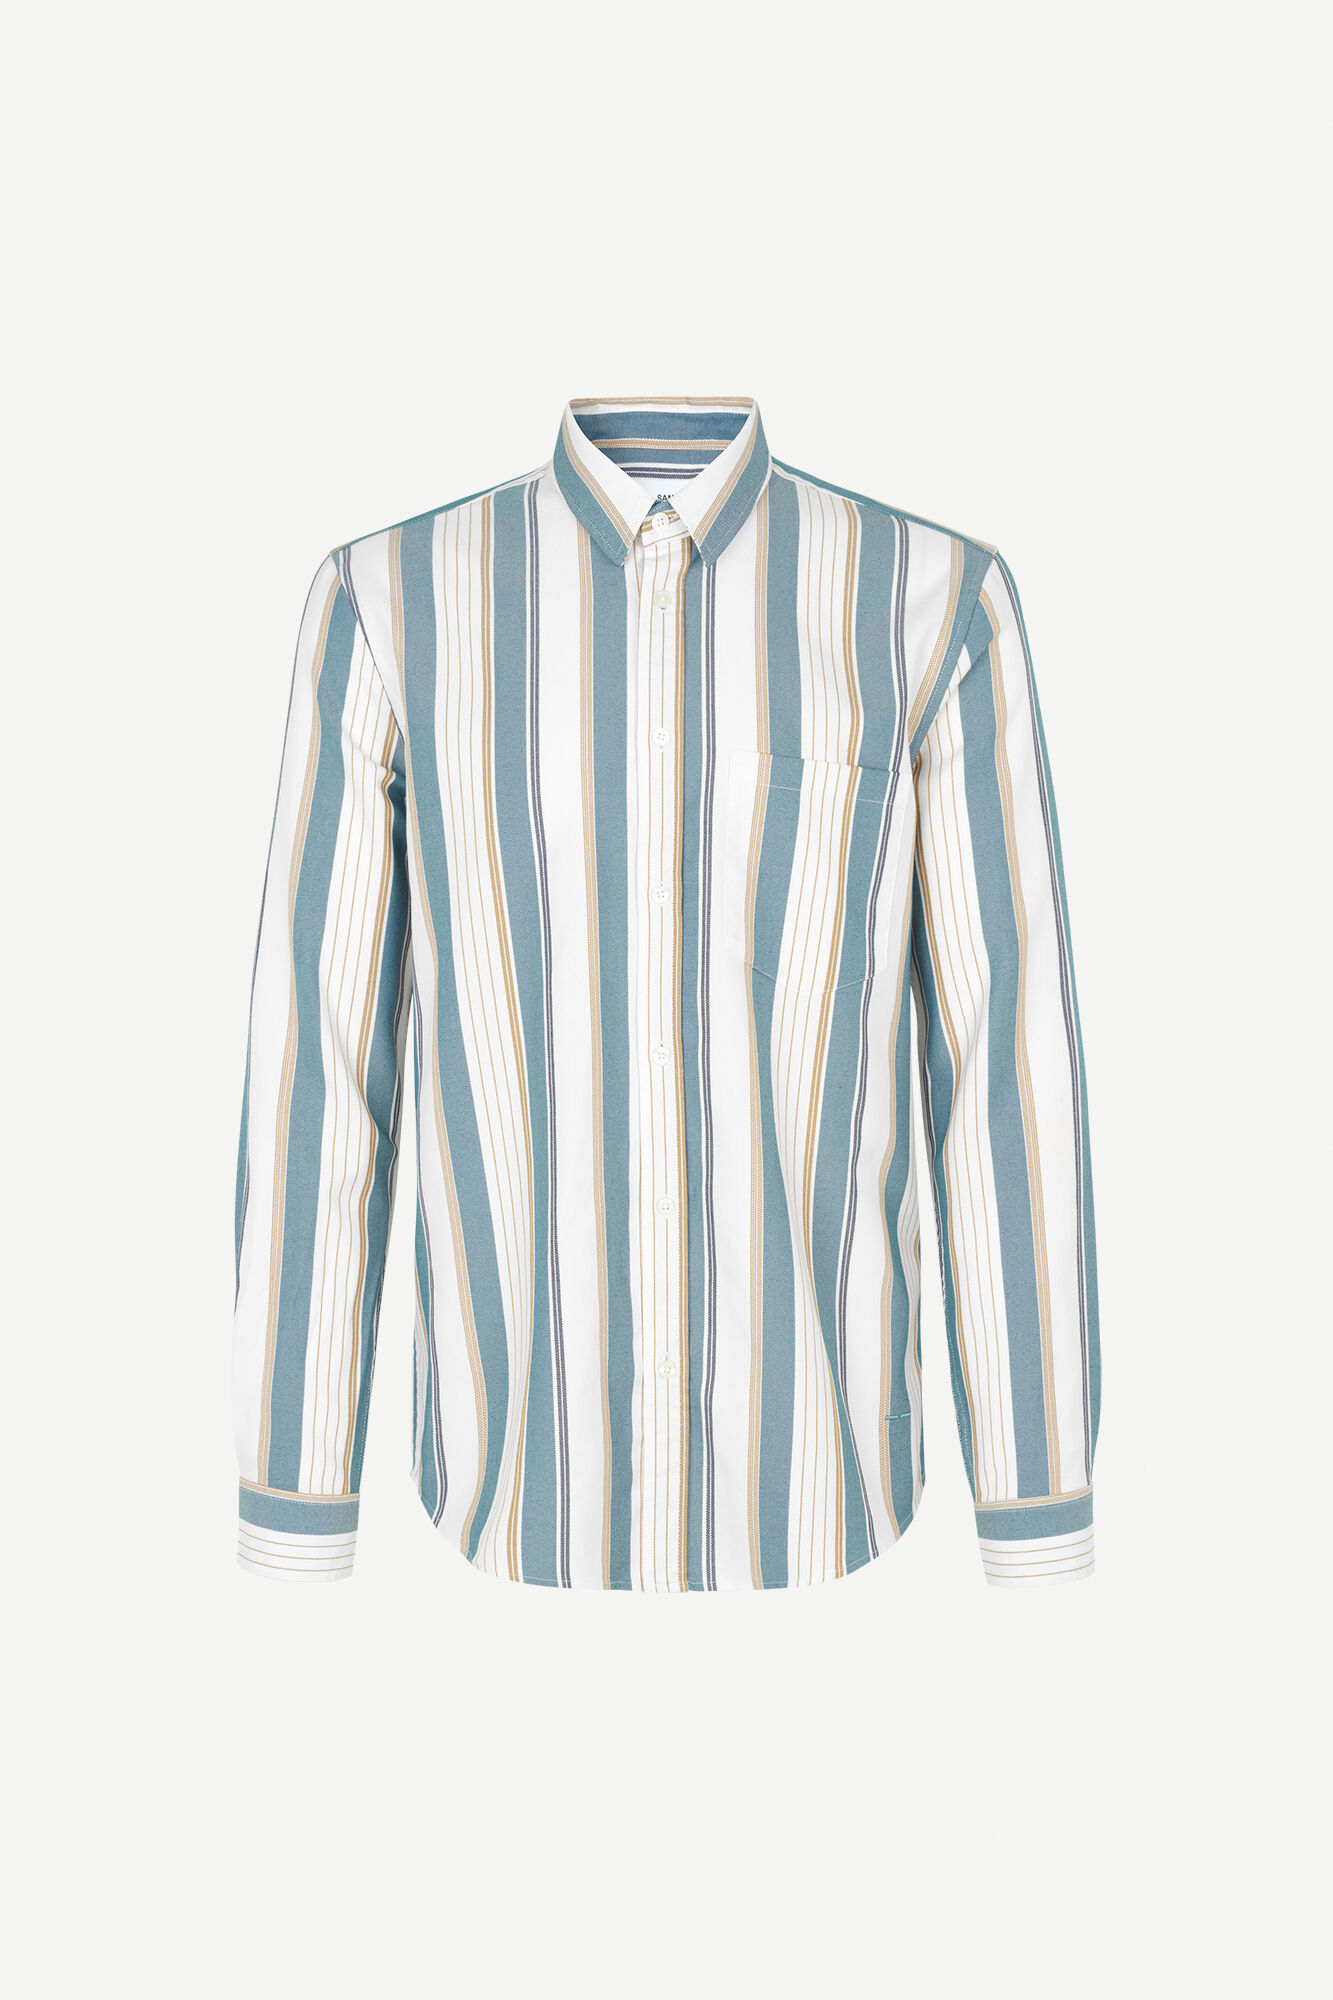 Liam NP shirt 12965, STARGAZER ST.